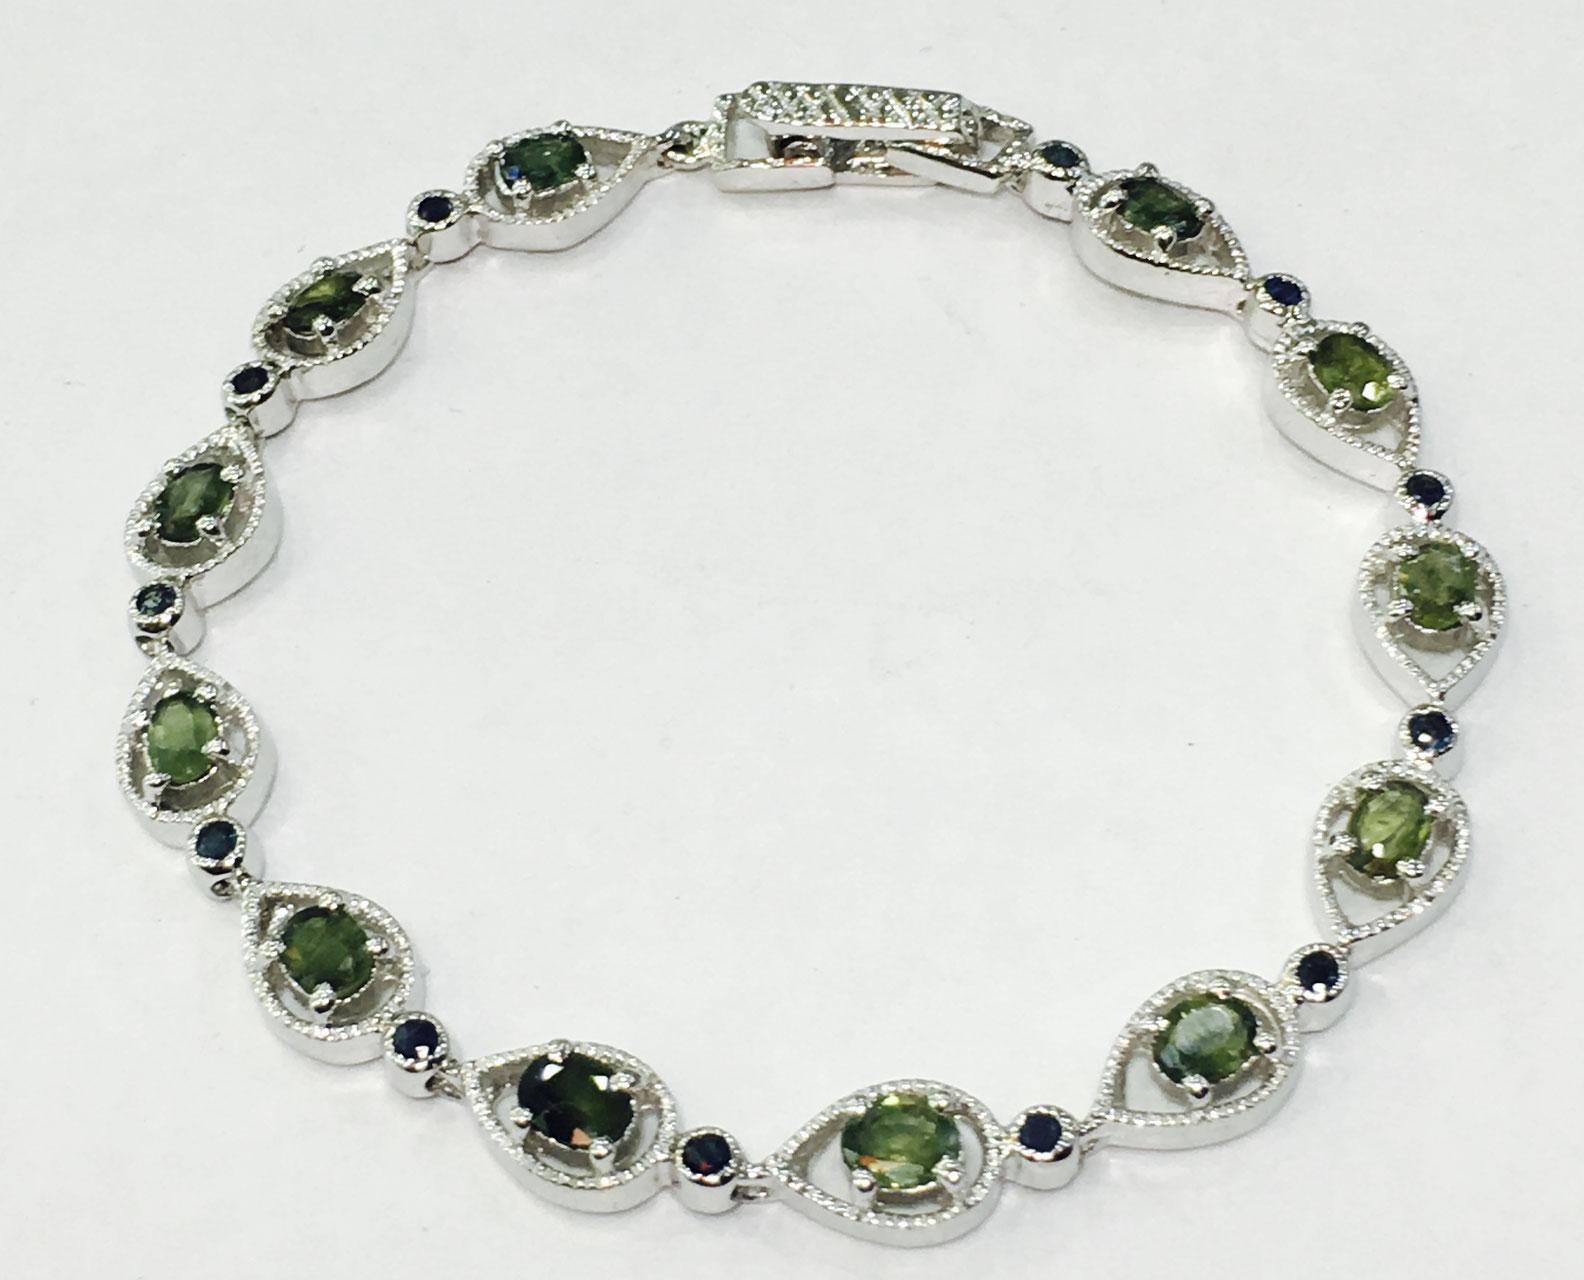 Bracelets 2 - cta-gems Website!